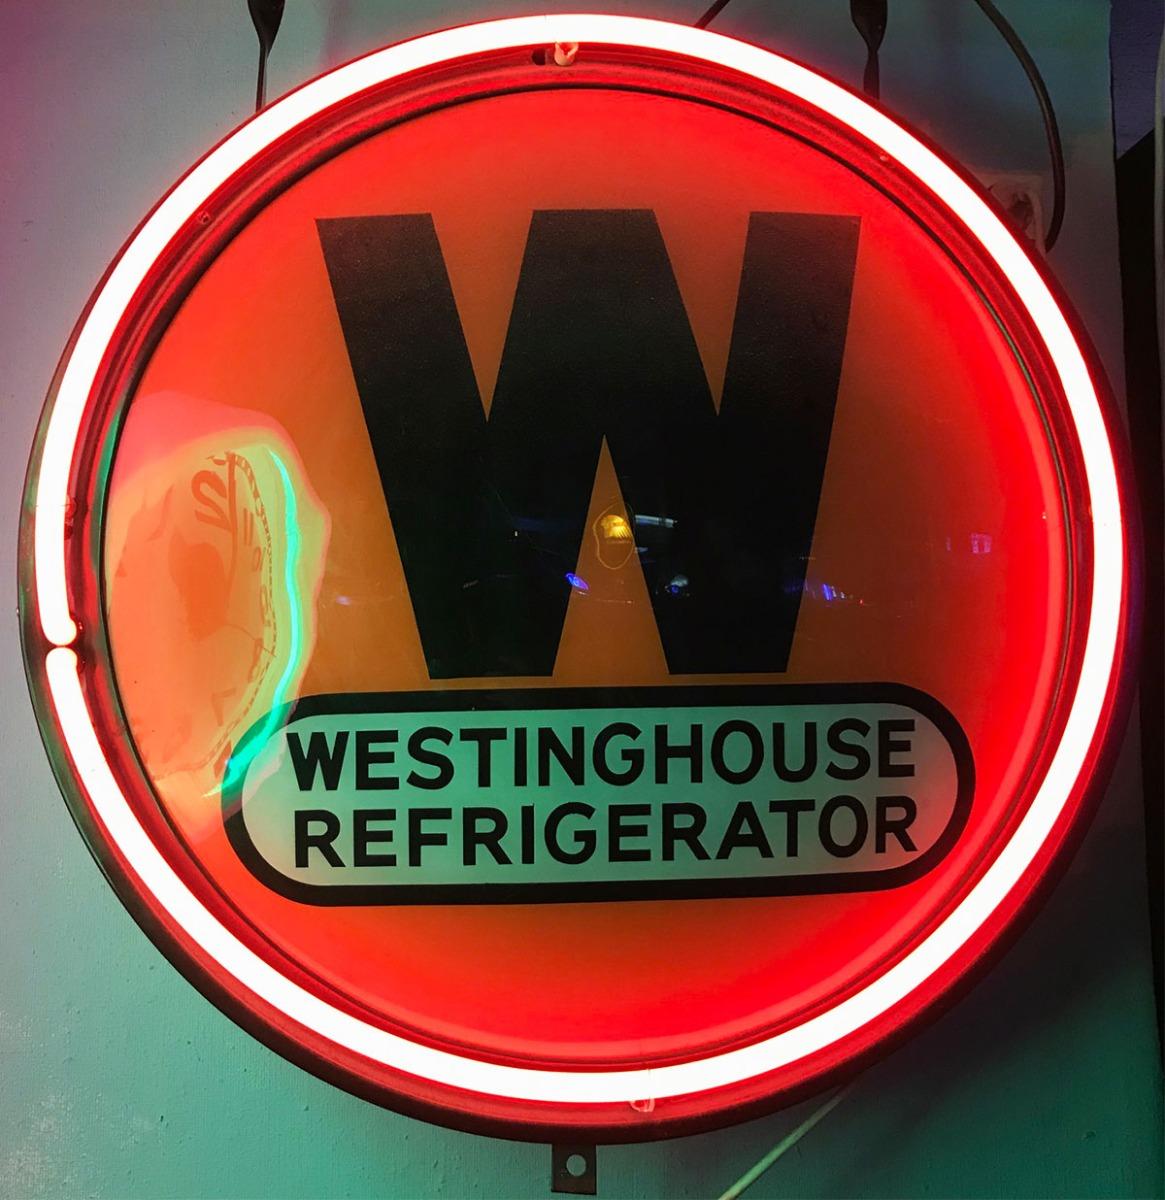 Westinghouse Refrigerator Neon Verlichting - Origineel